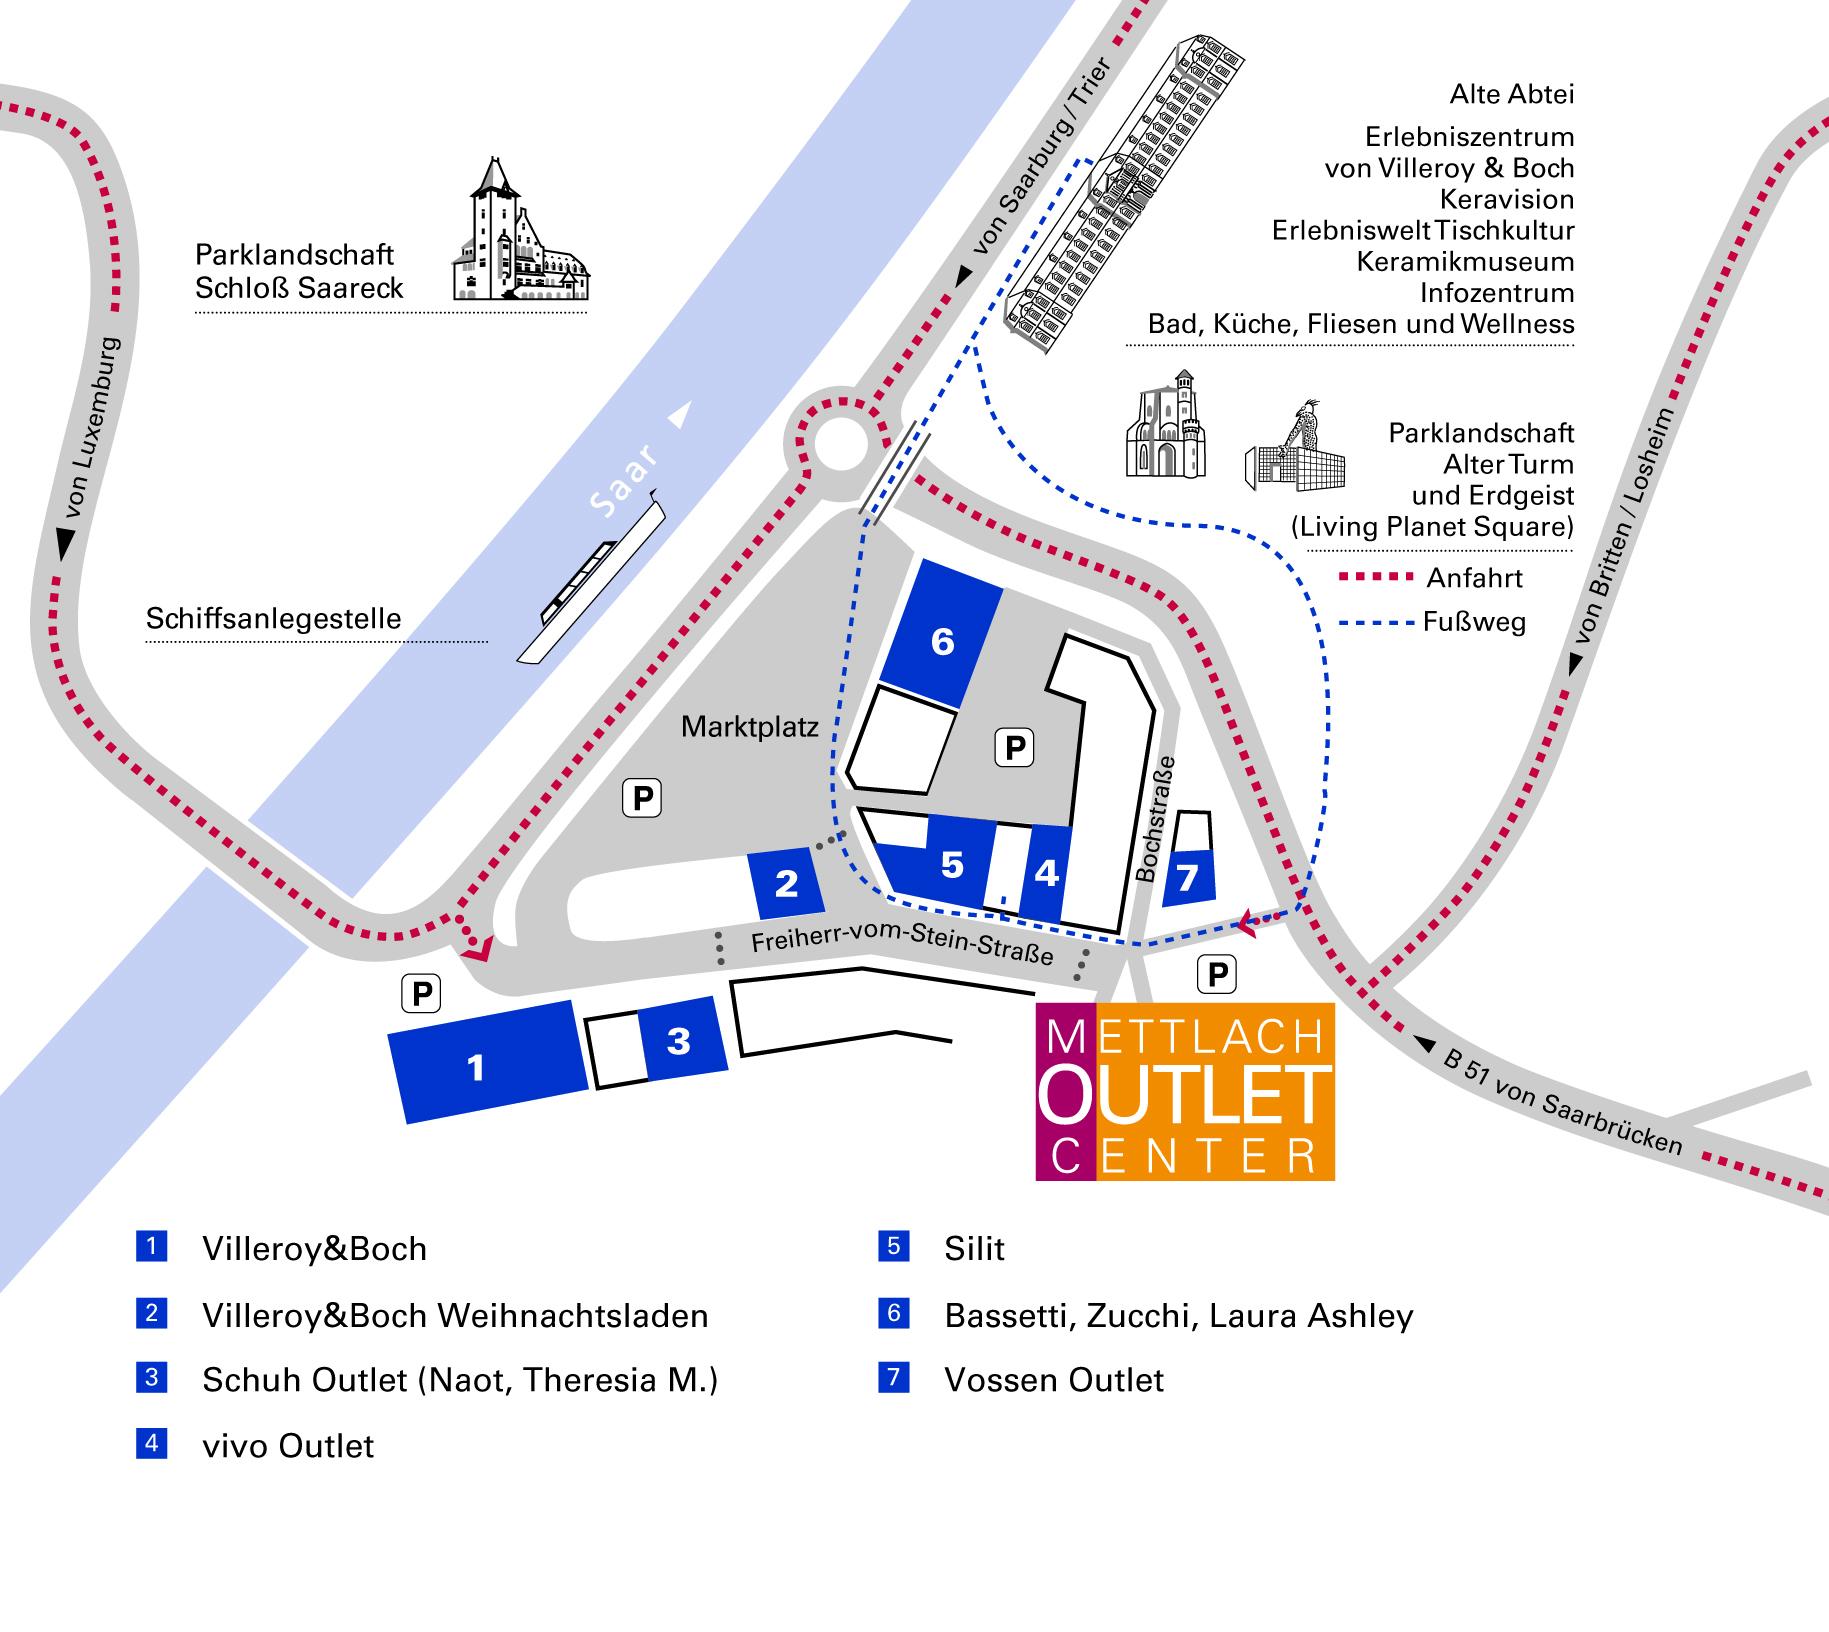 Lageplan_Mettlach_Outlet_Center_2015